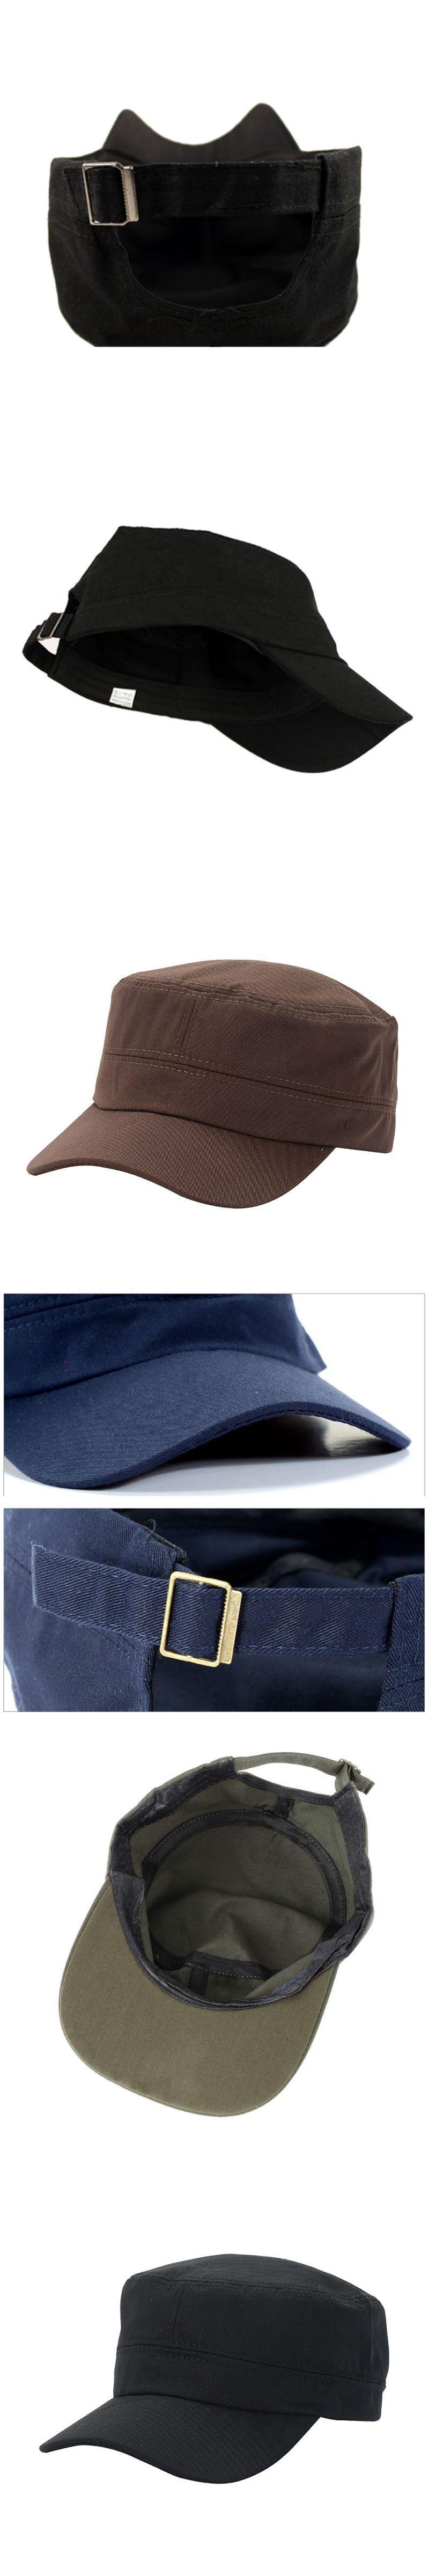 55a4b7d4704c60 New Hot Adjustable Army Cadet Style Hat Cotton Cap Men Women Baseball Caps